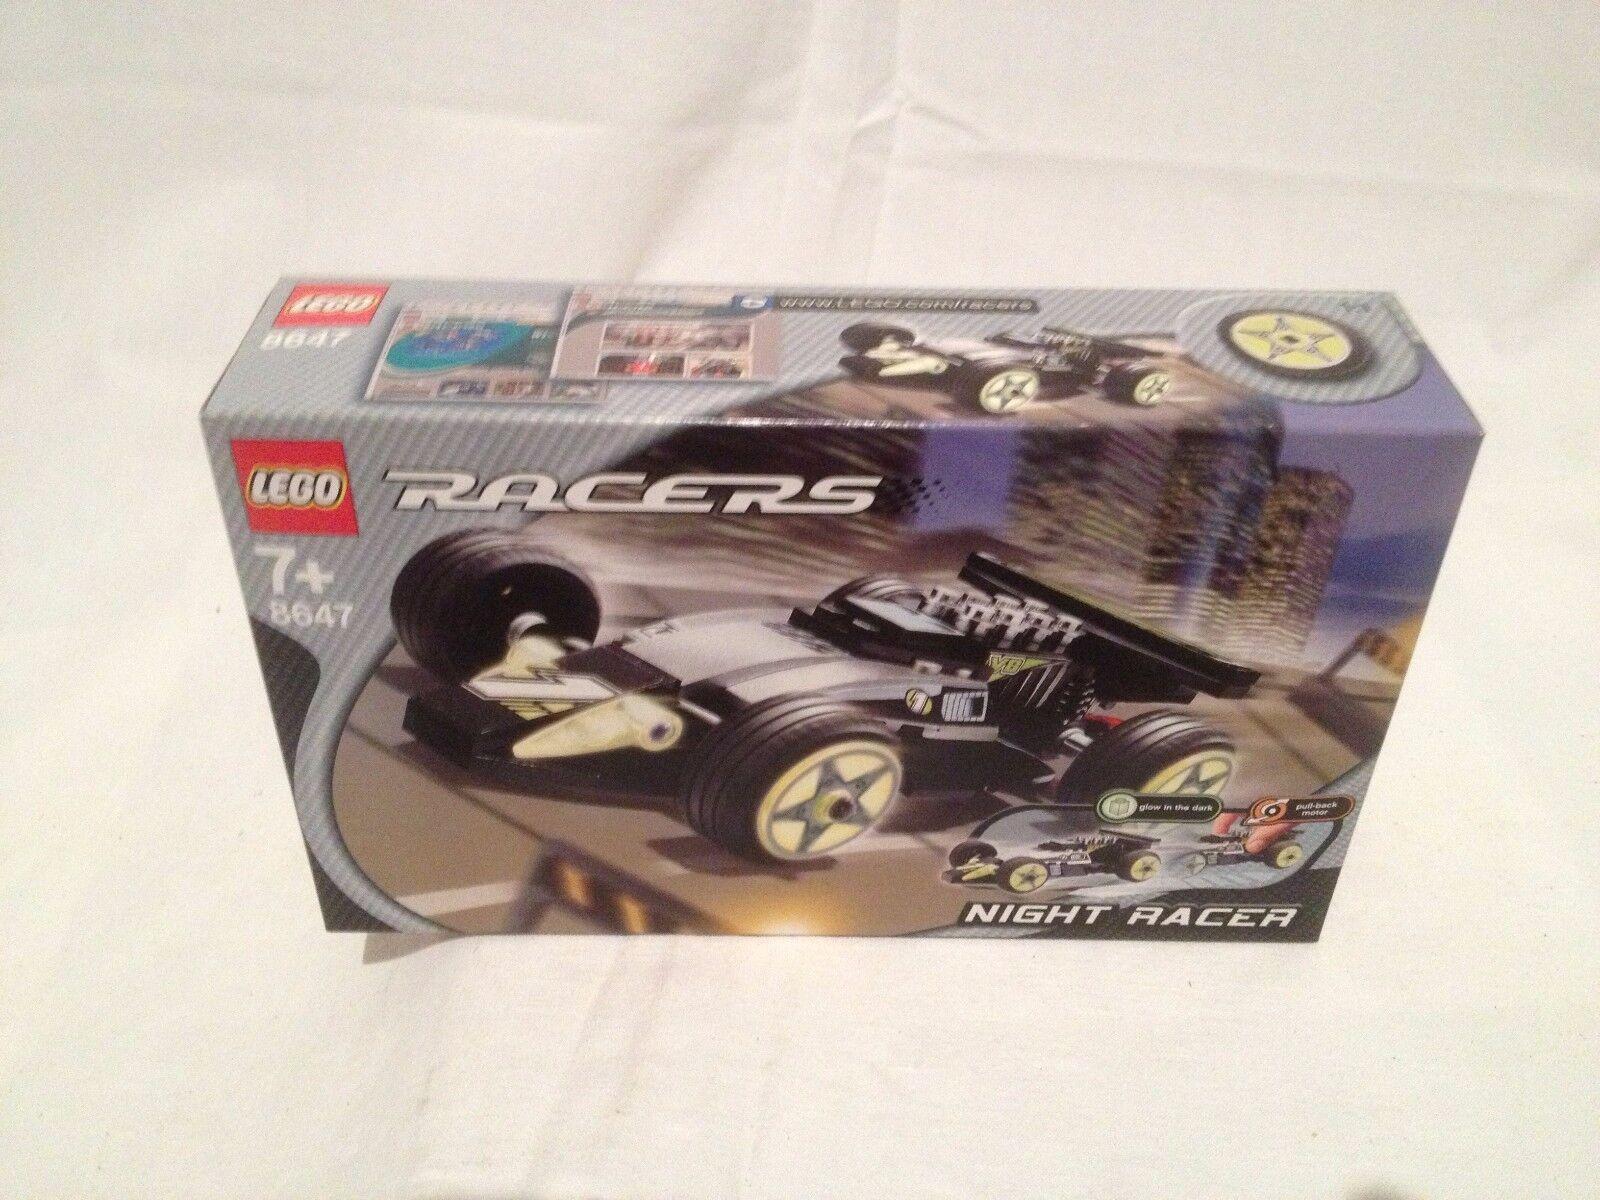 Lego Racer 8647 Night Racer NEUF NEUF NEUF 1 édition 15f6b8